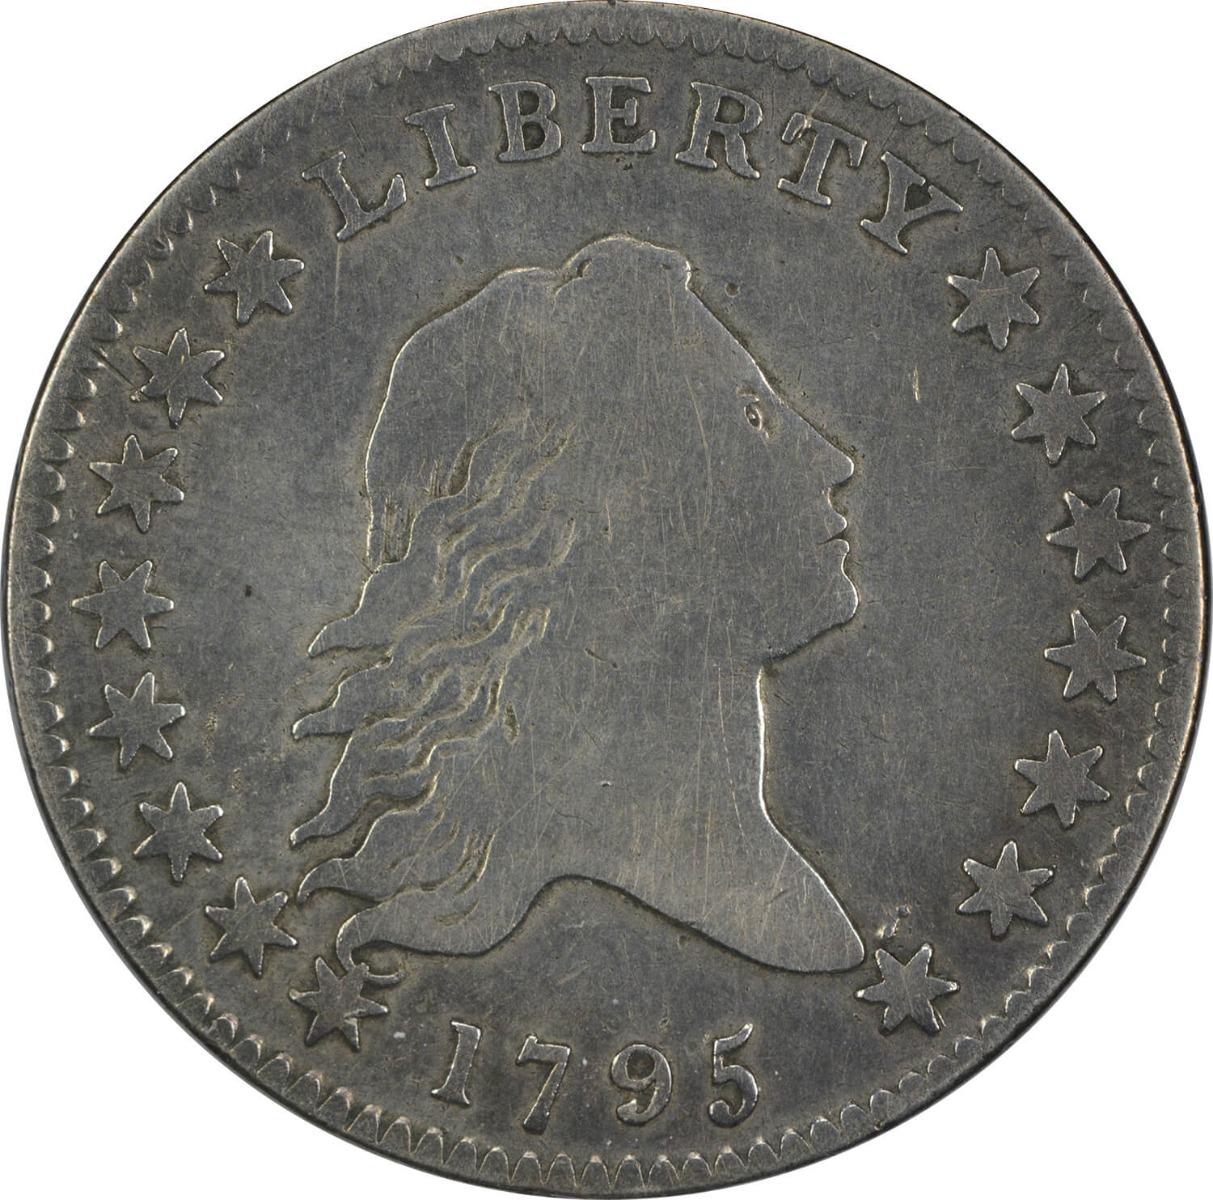 1795 Bust Half Dollar 2 Leaves F Uncertified